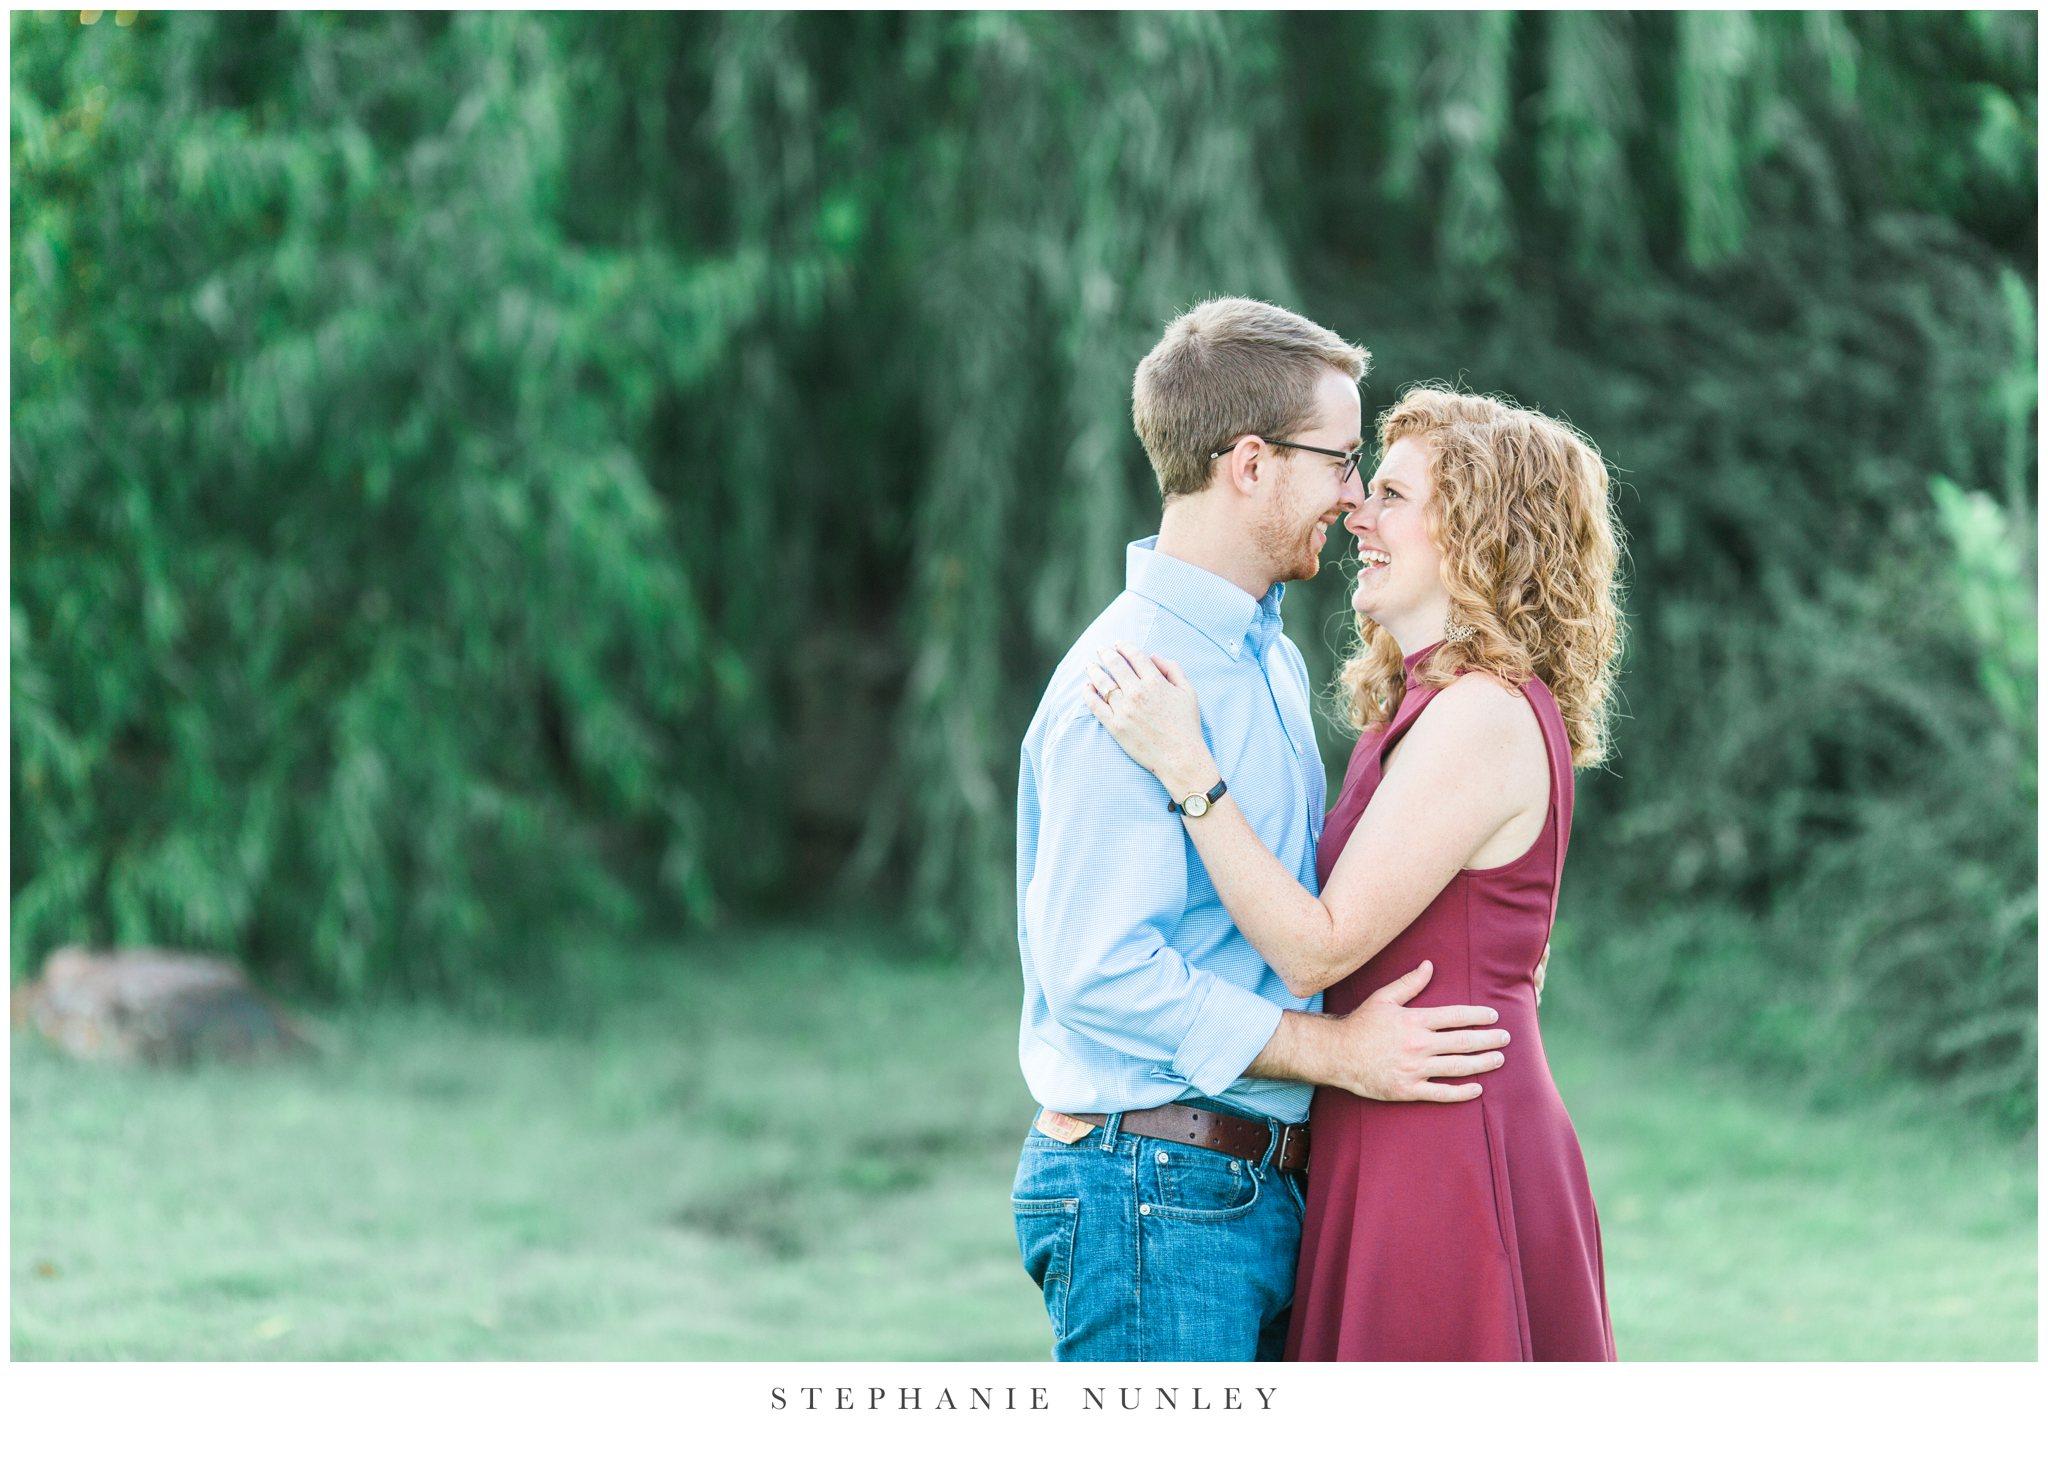 bentonville-arkansas-classic-engagement-photos-0023.jpg